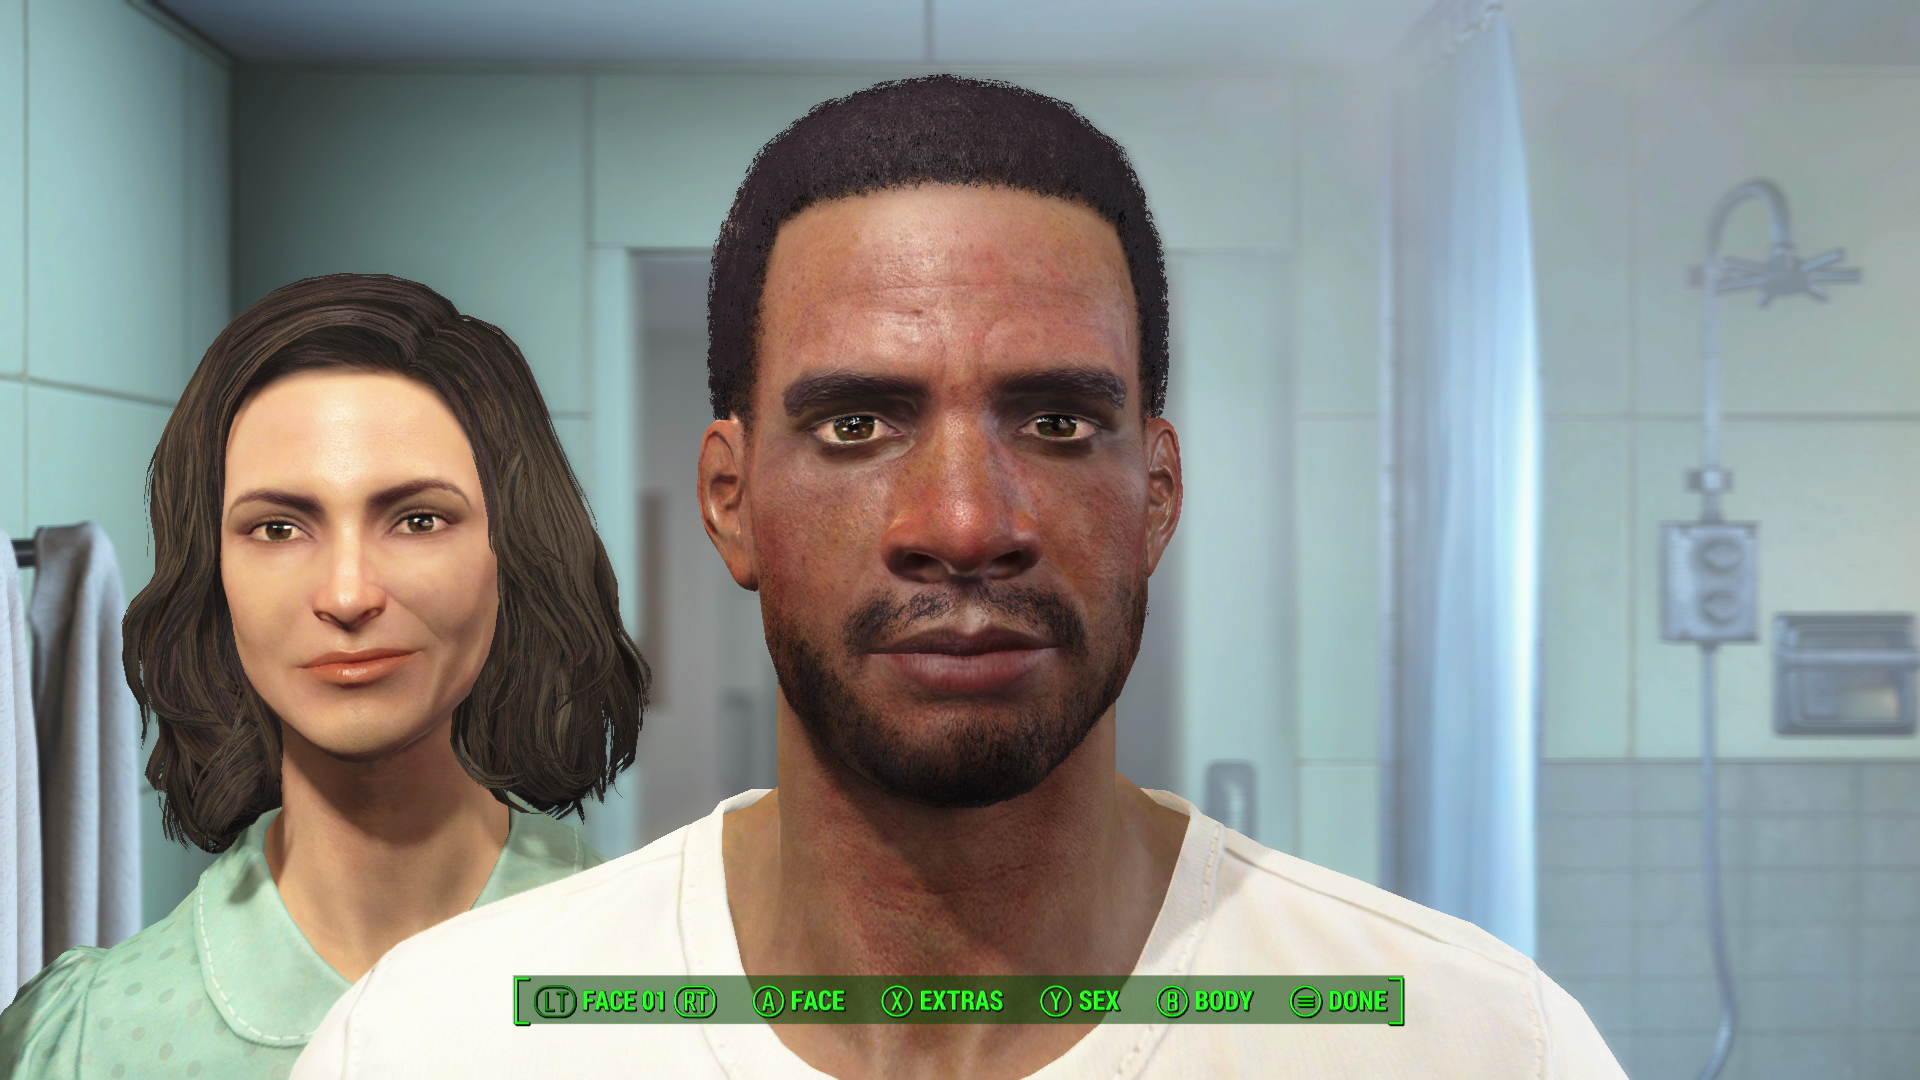 Fallout4_E3_FaceCreation2_1434323967